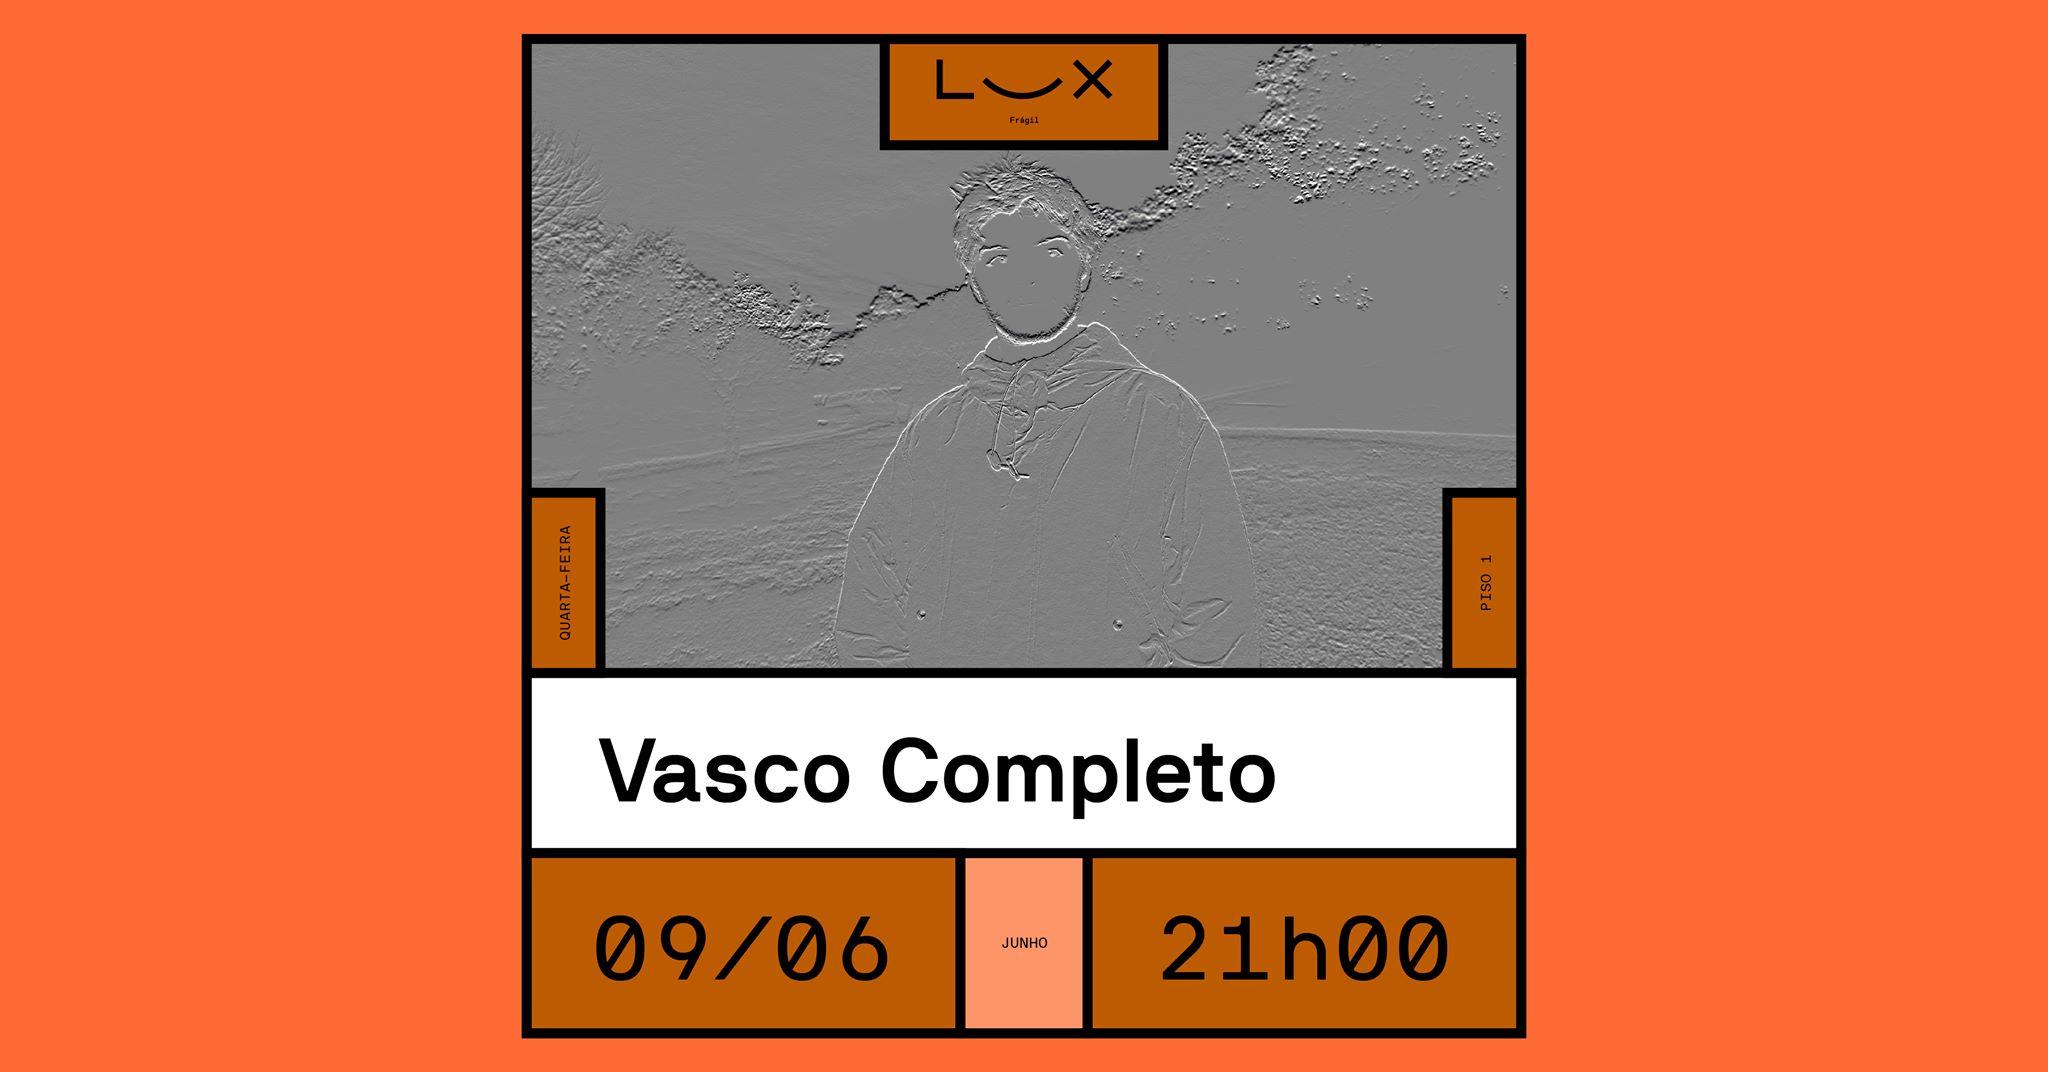 Vasco Completo